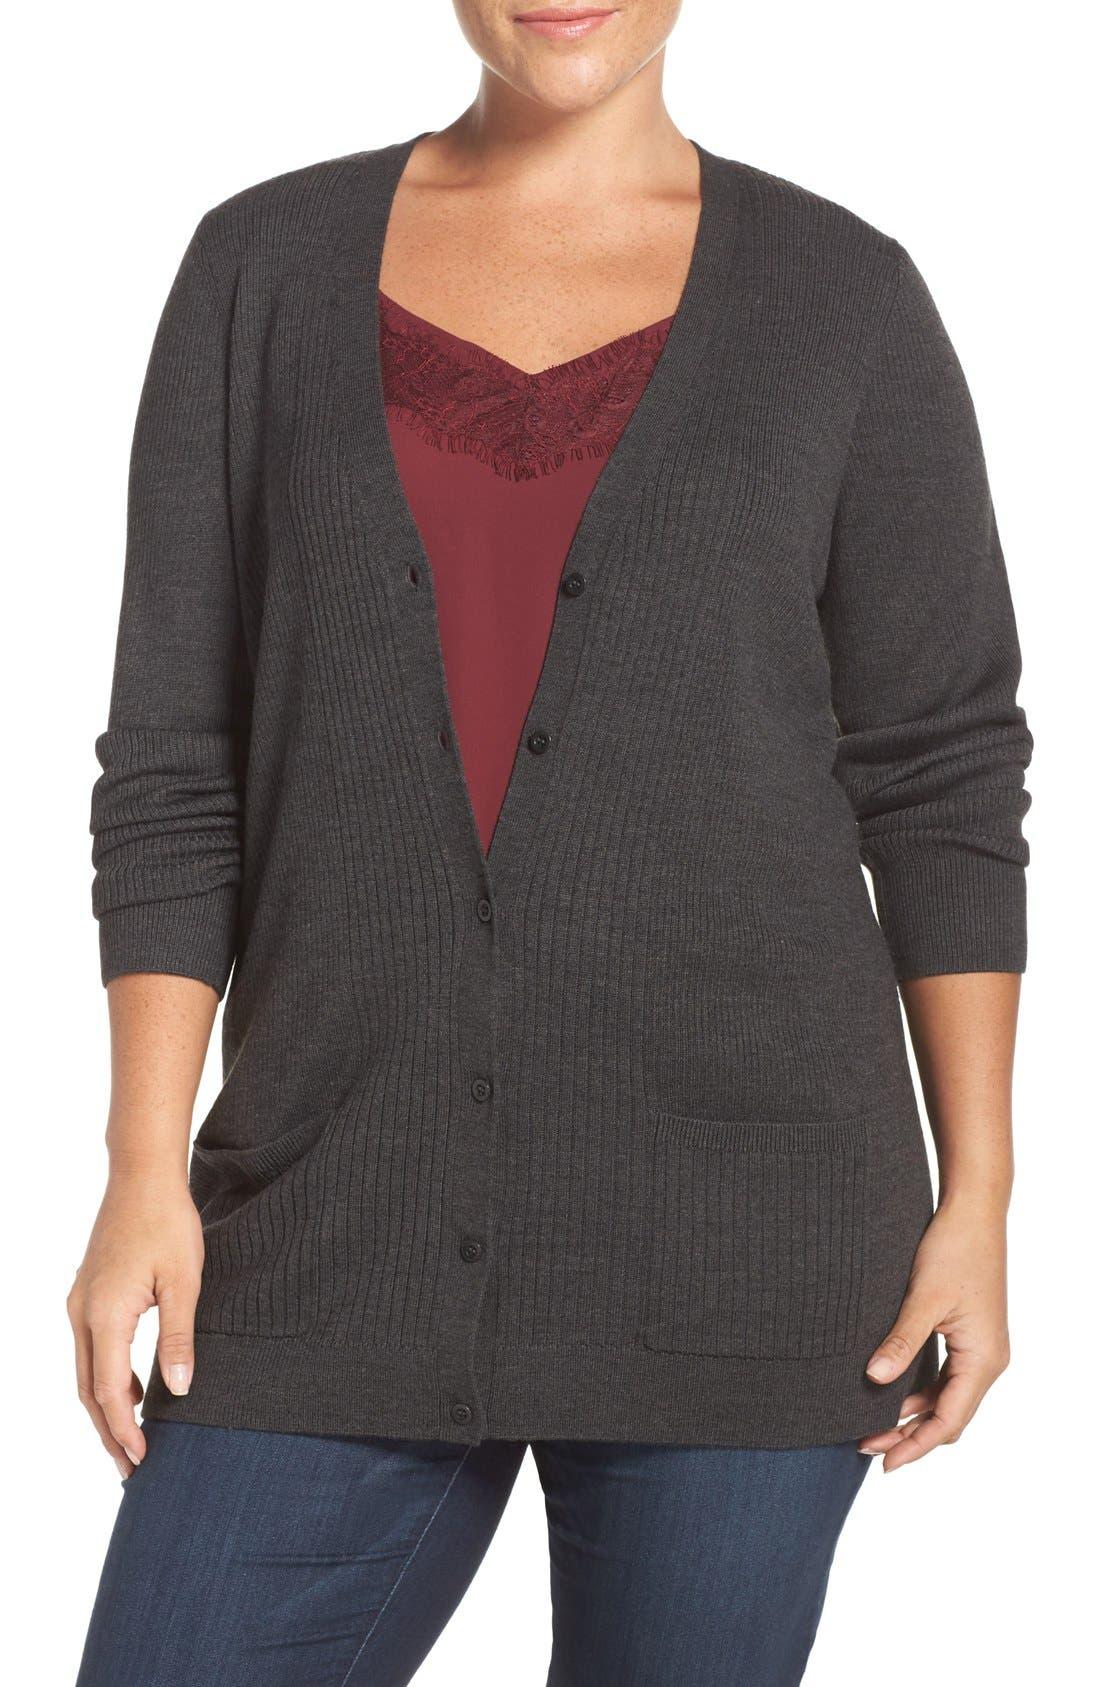 Ribbed V-Neck Cardigan,                         Main,                         color, Grey Dark Charcoal Heather